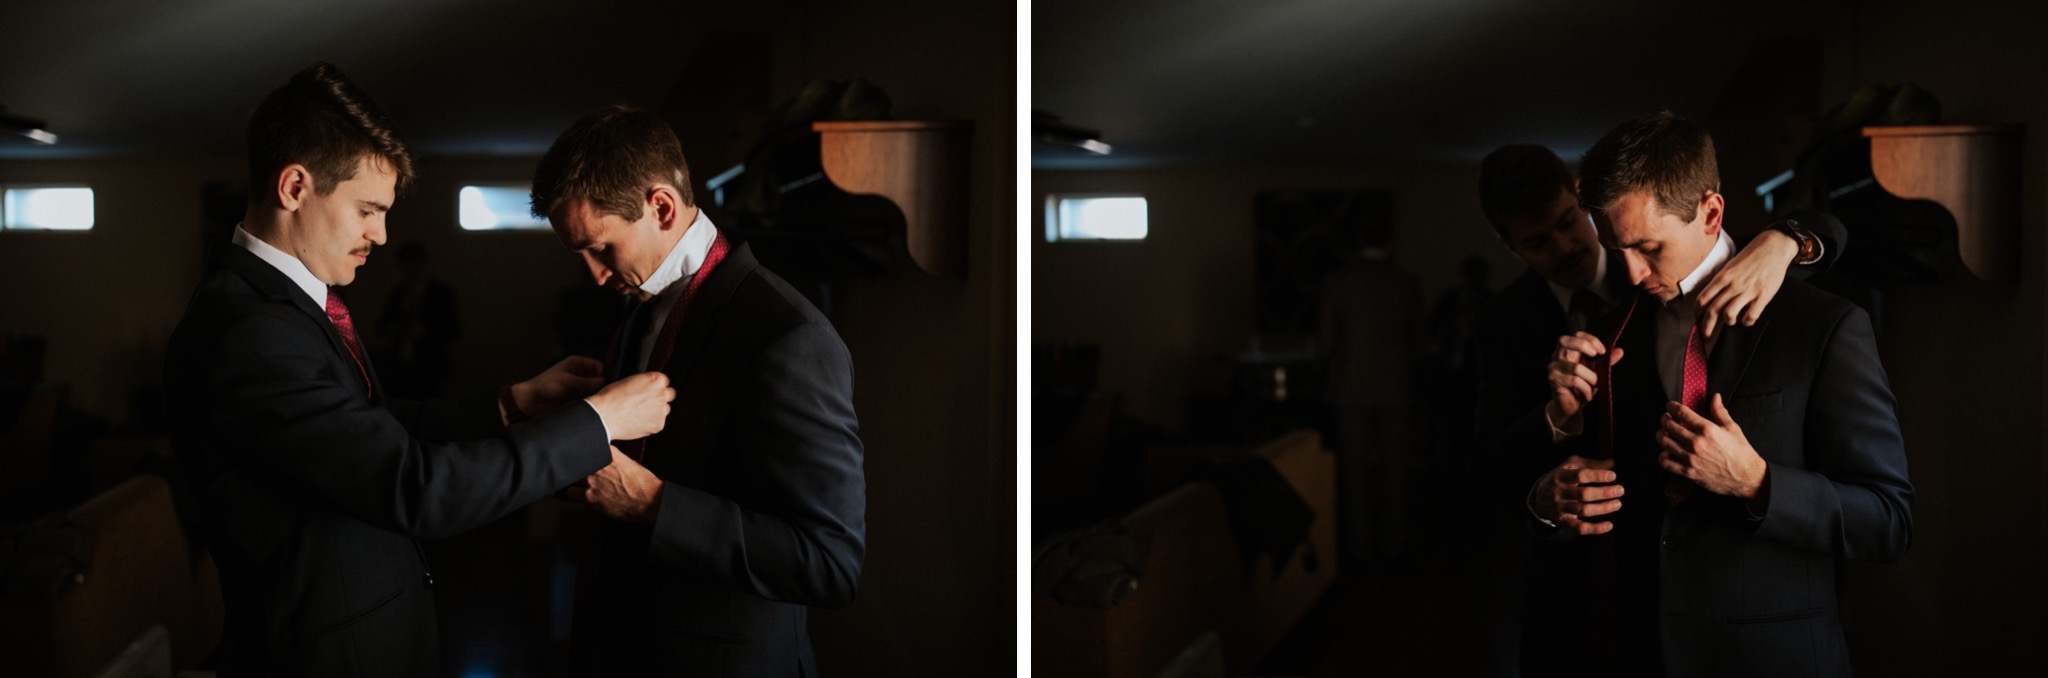 18_West Manor Estate Weddings - Pat Cori Photography-37_West Manor Estate Weddings - Pat Cori Photography-38_Portraits_PatCoriPhotography_groom_VirginiaWeddingPhotographer_WestManorEstate_gettingready.jpg